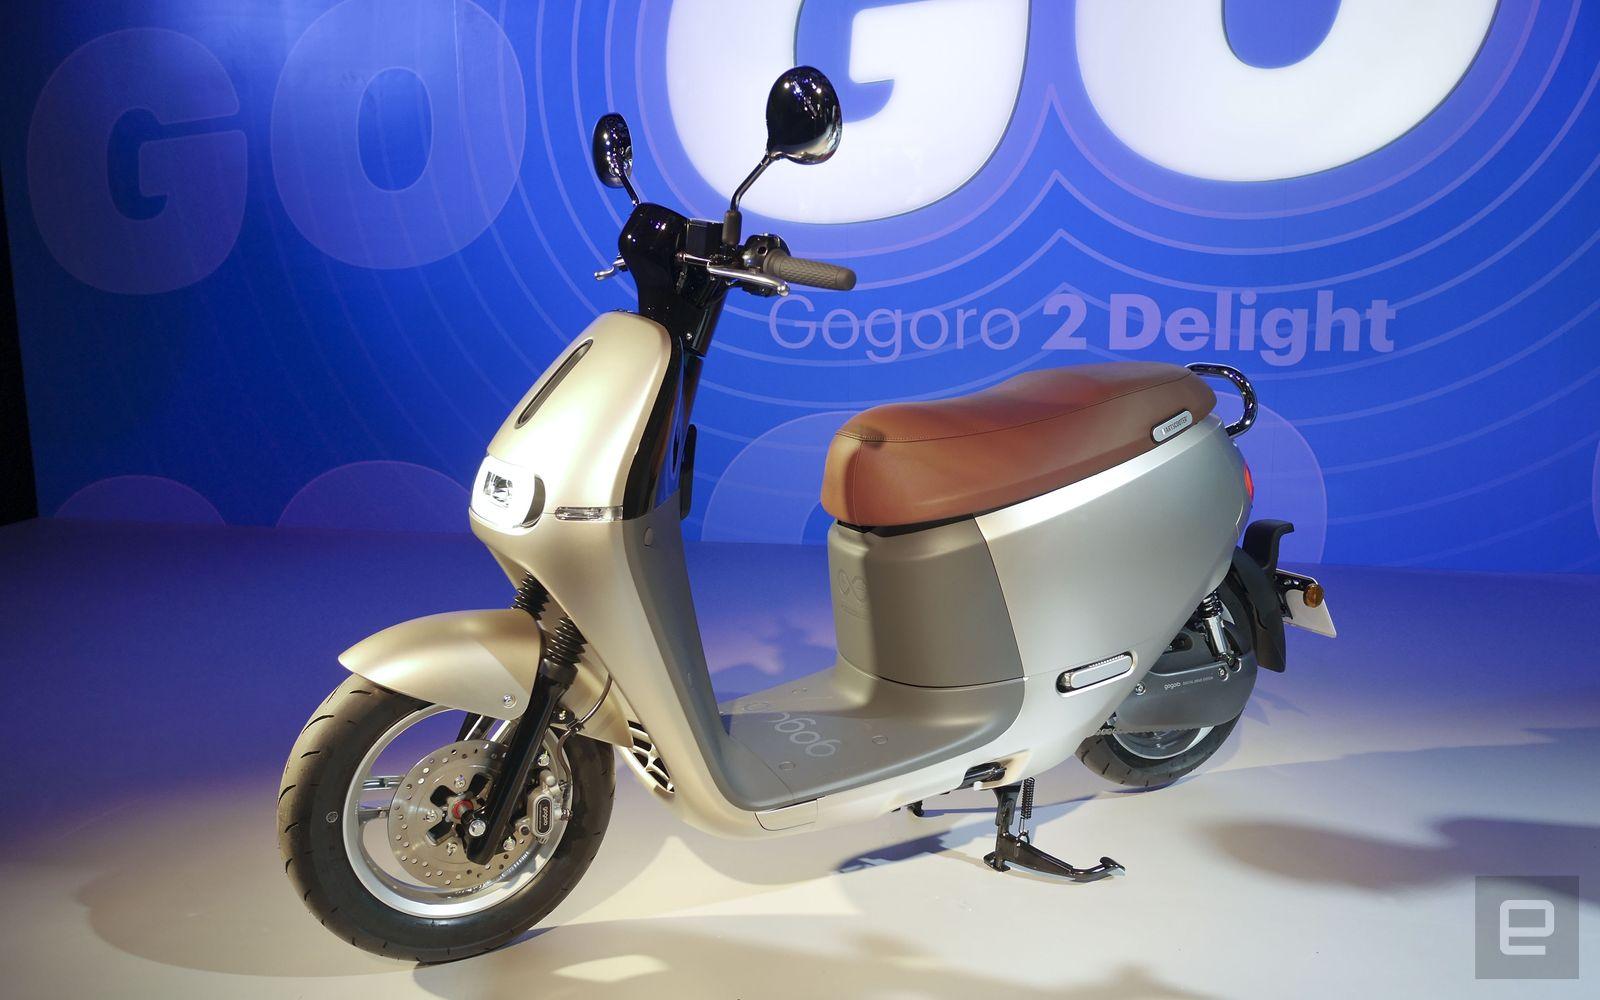 Gogoro 發表性能新車「S2」與女性向的「2 Delight」